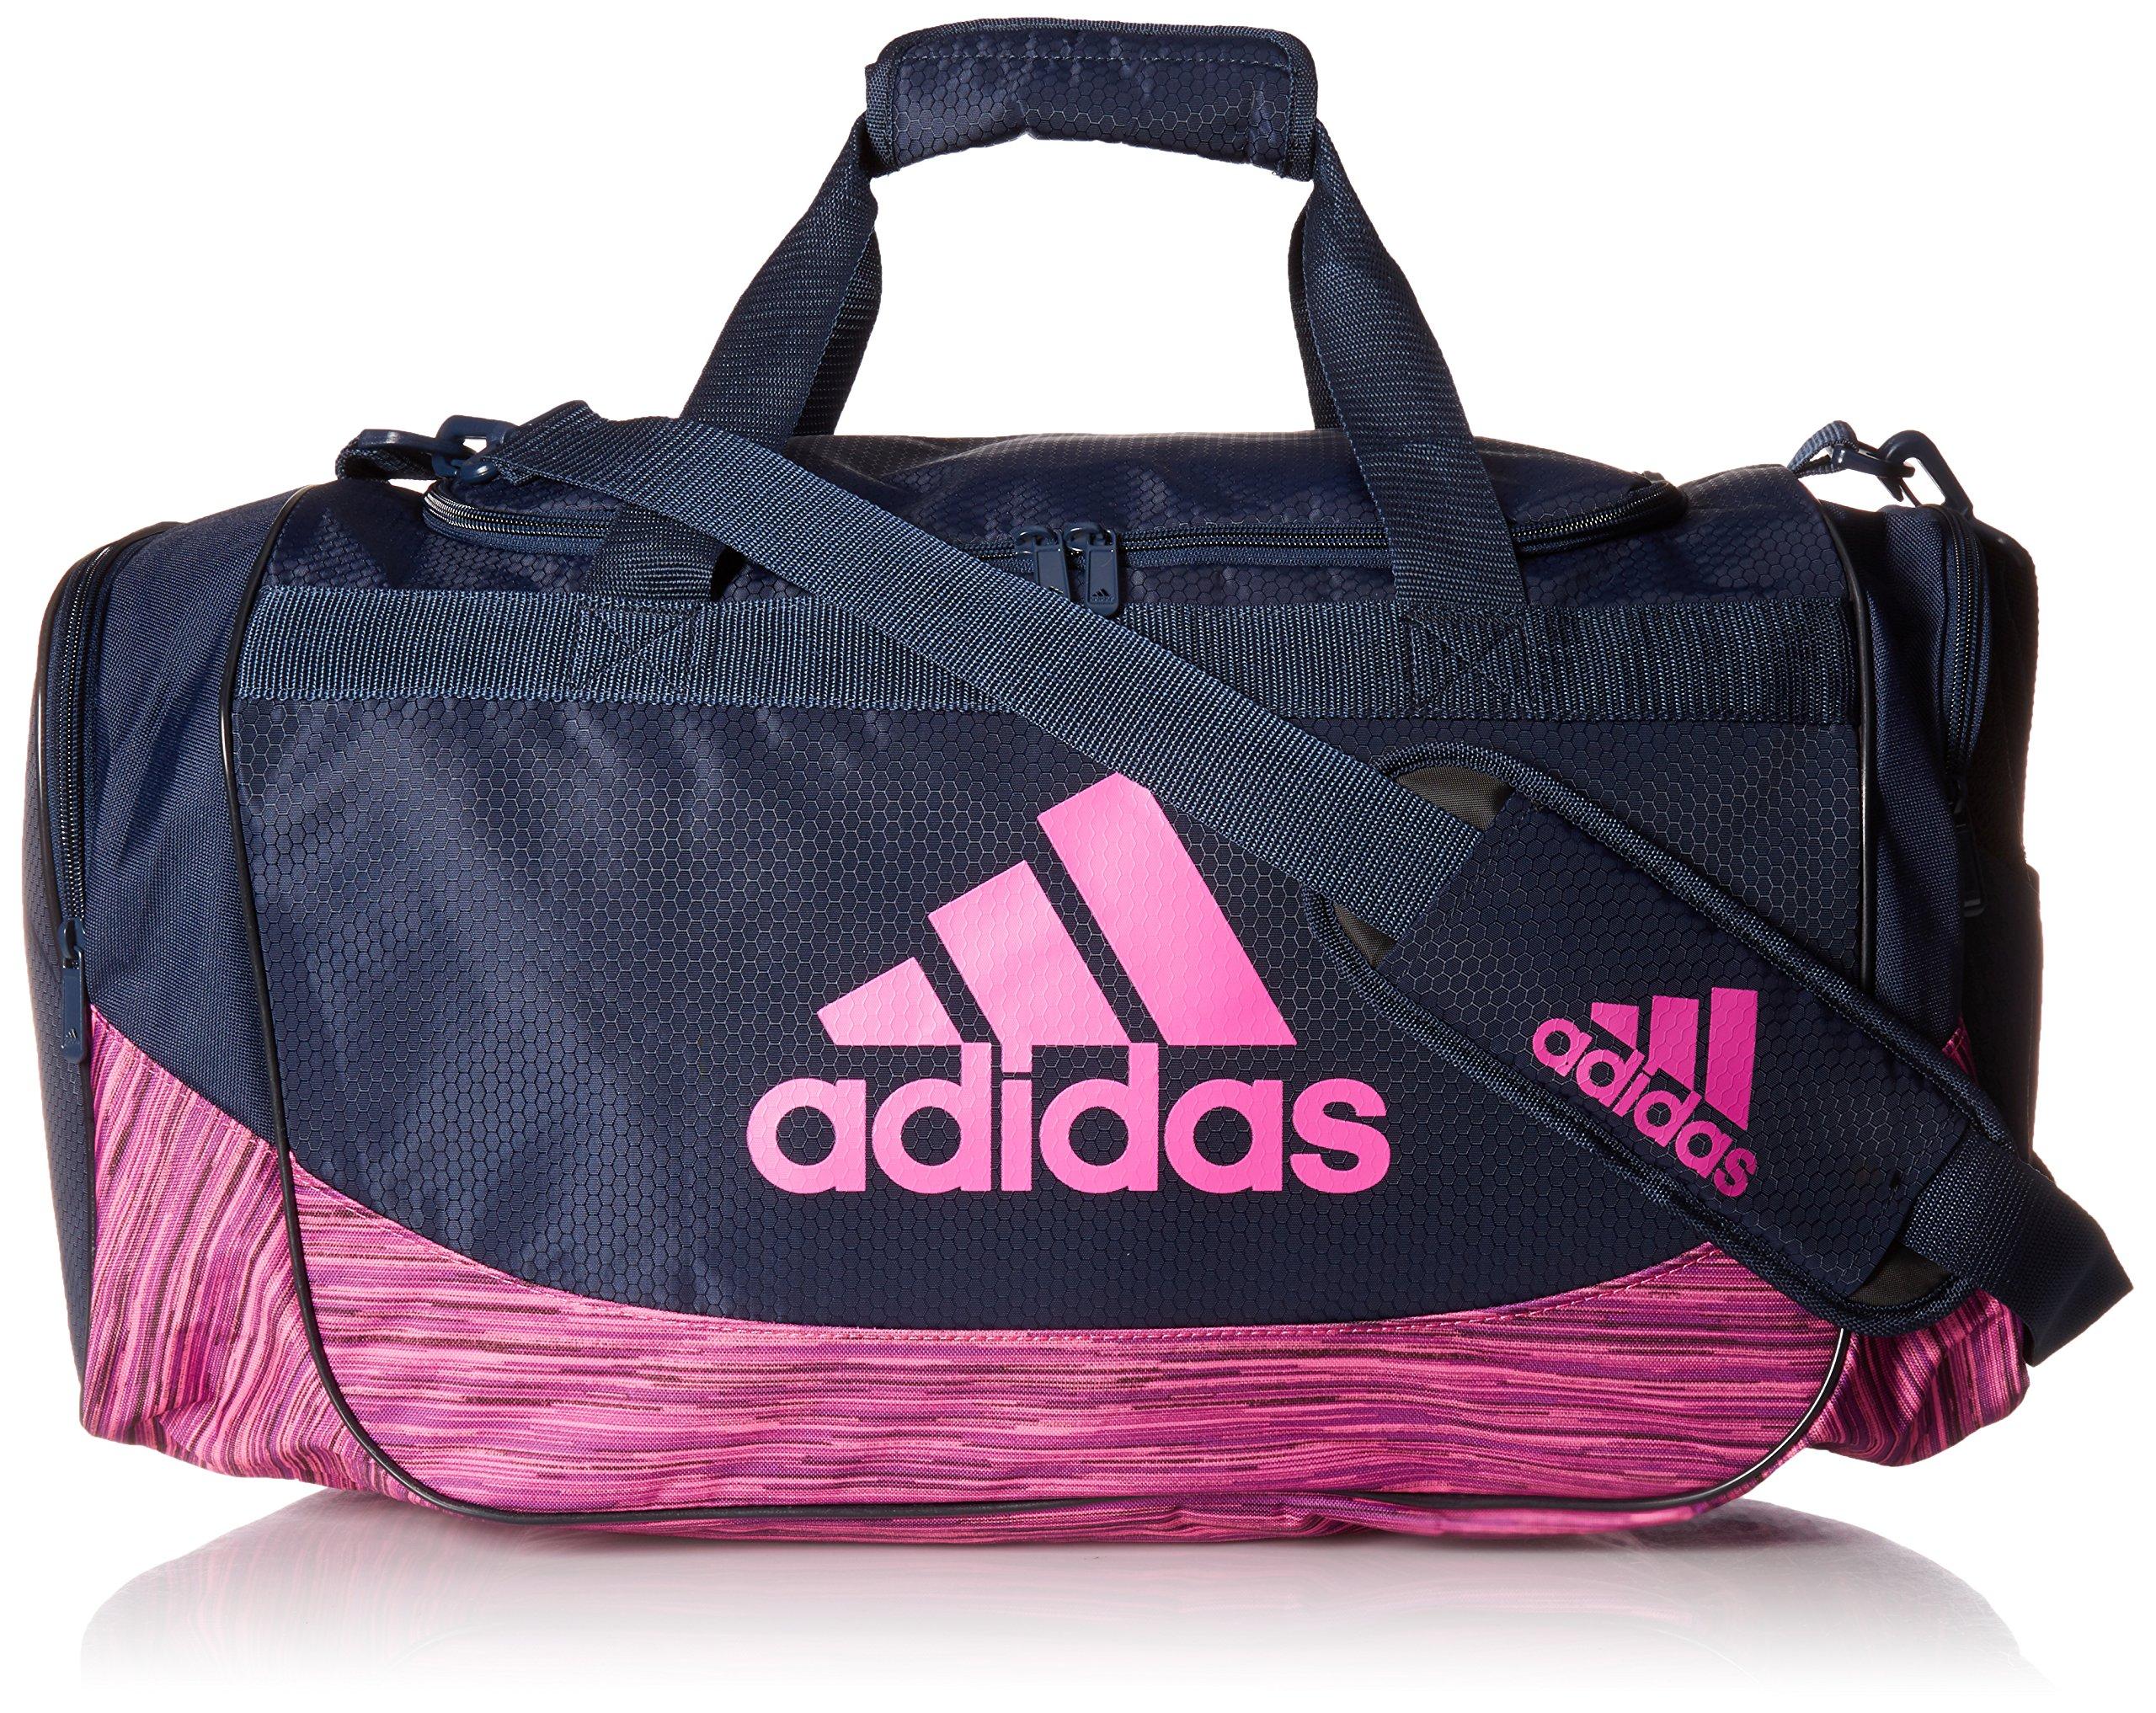 adidas Unisex Medium Defense Duffel Collegiate Navy/Shock Pink/Shock Pink Looper One Size